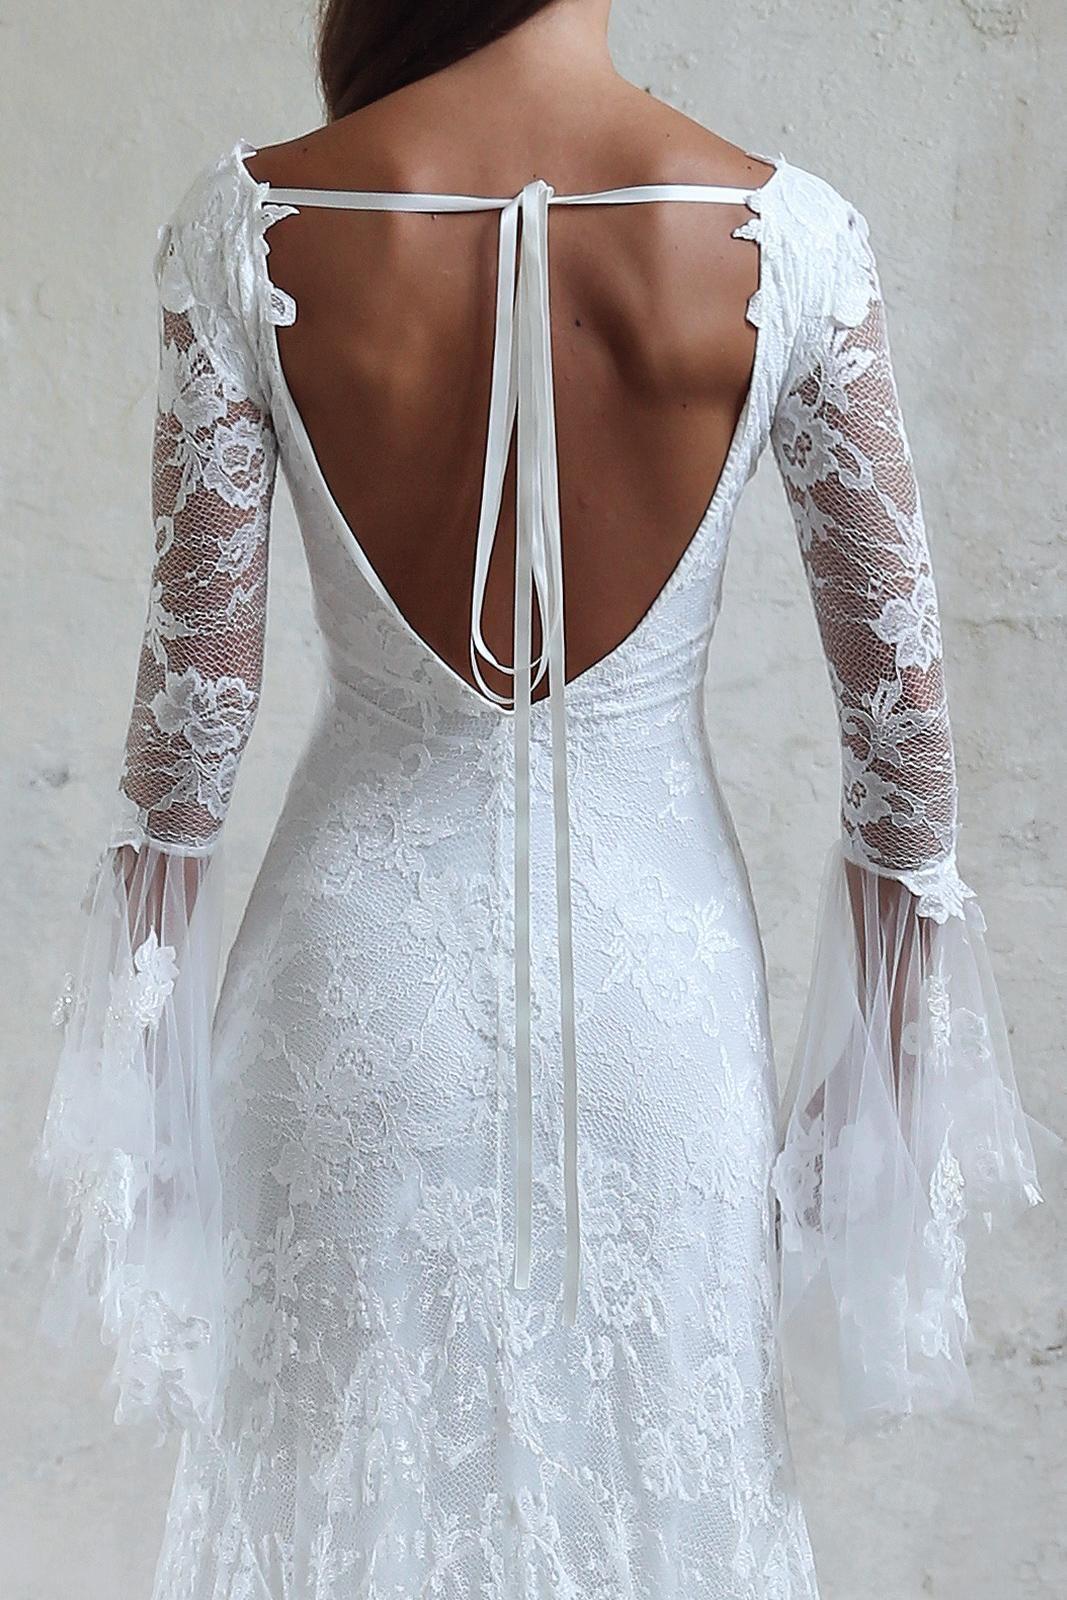 Francis | Grace Loves Lace | Bride braid | Pinterest | French lace ...